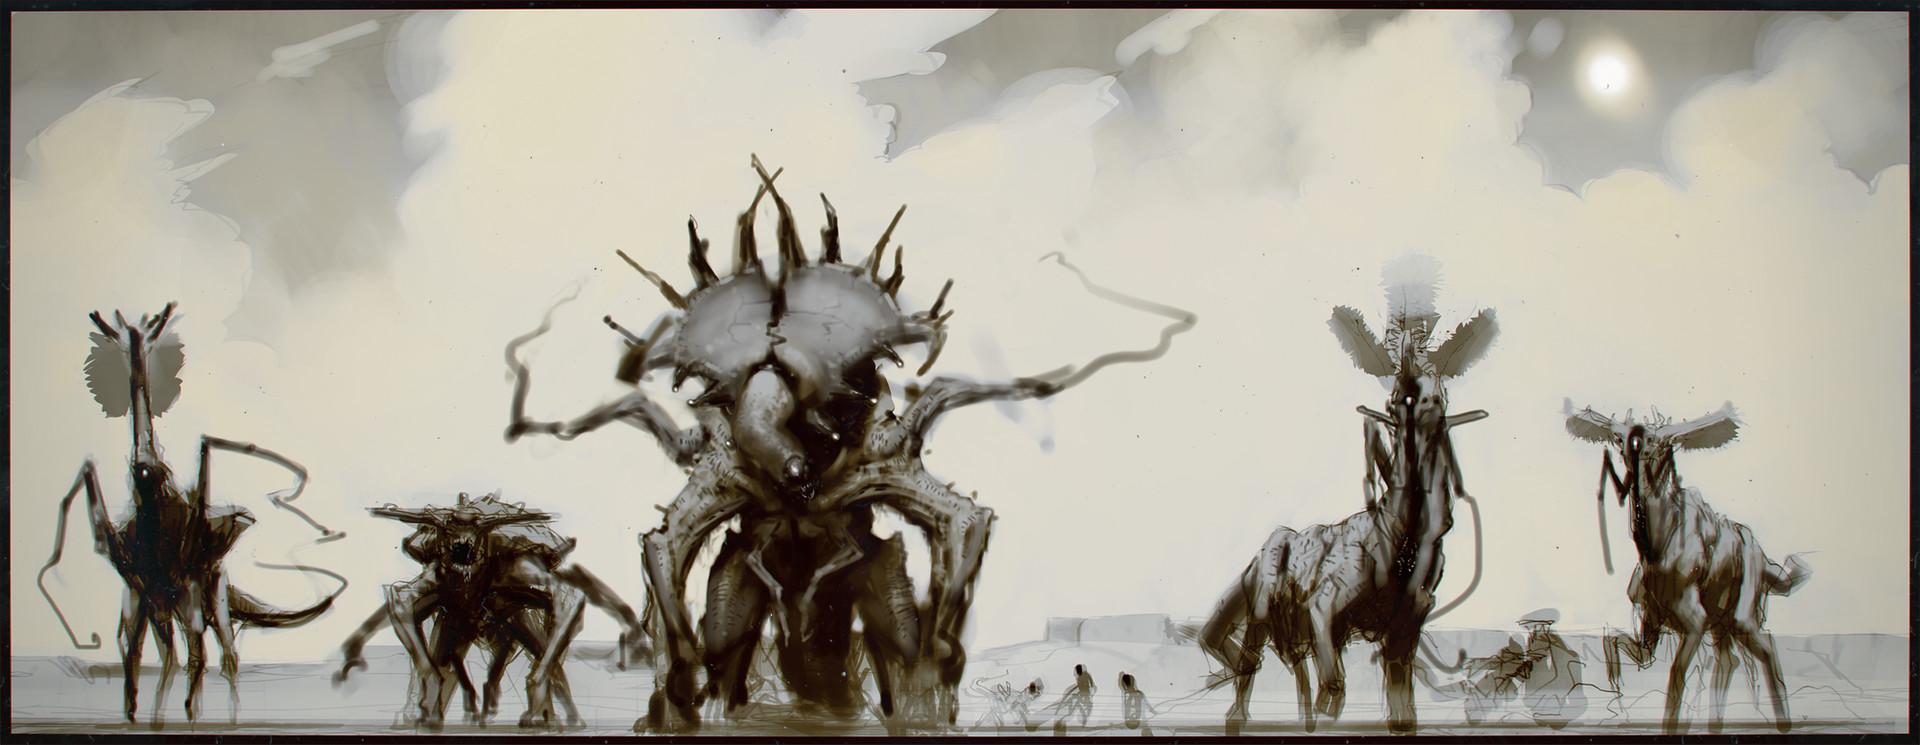 Scott flanders invader monsters 4